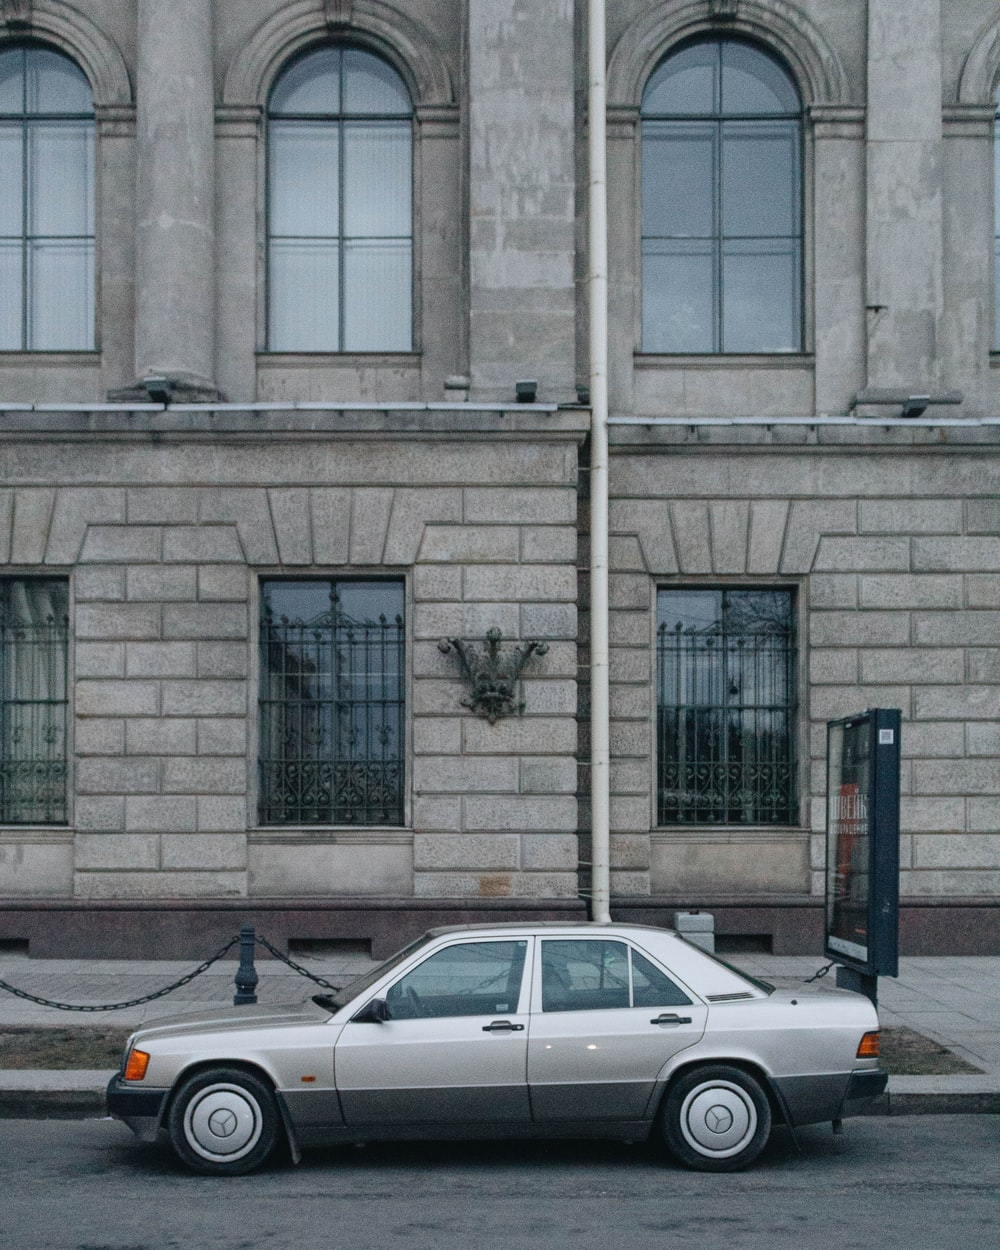 white sedan parked beside building during daytime